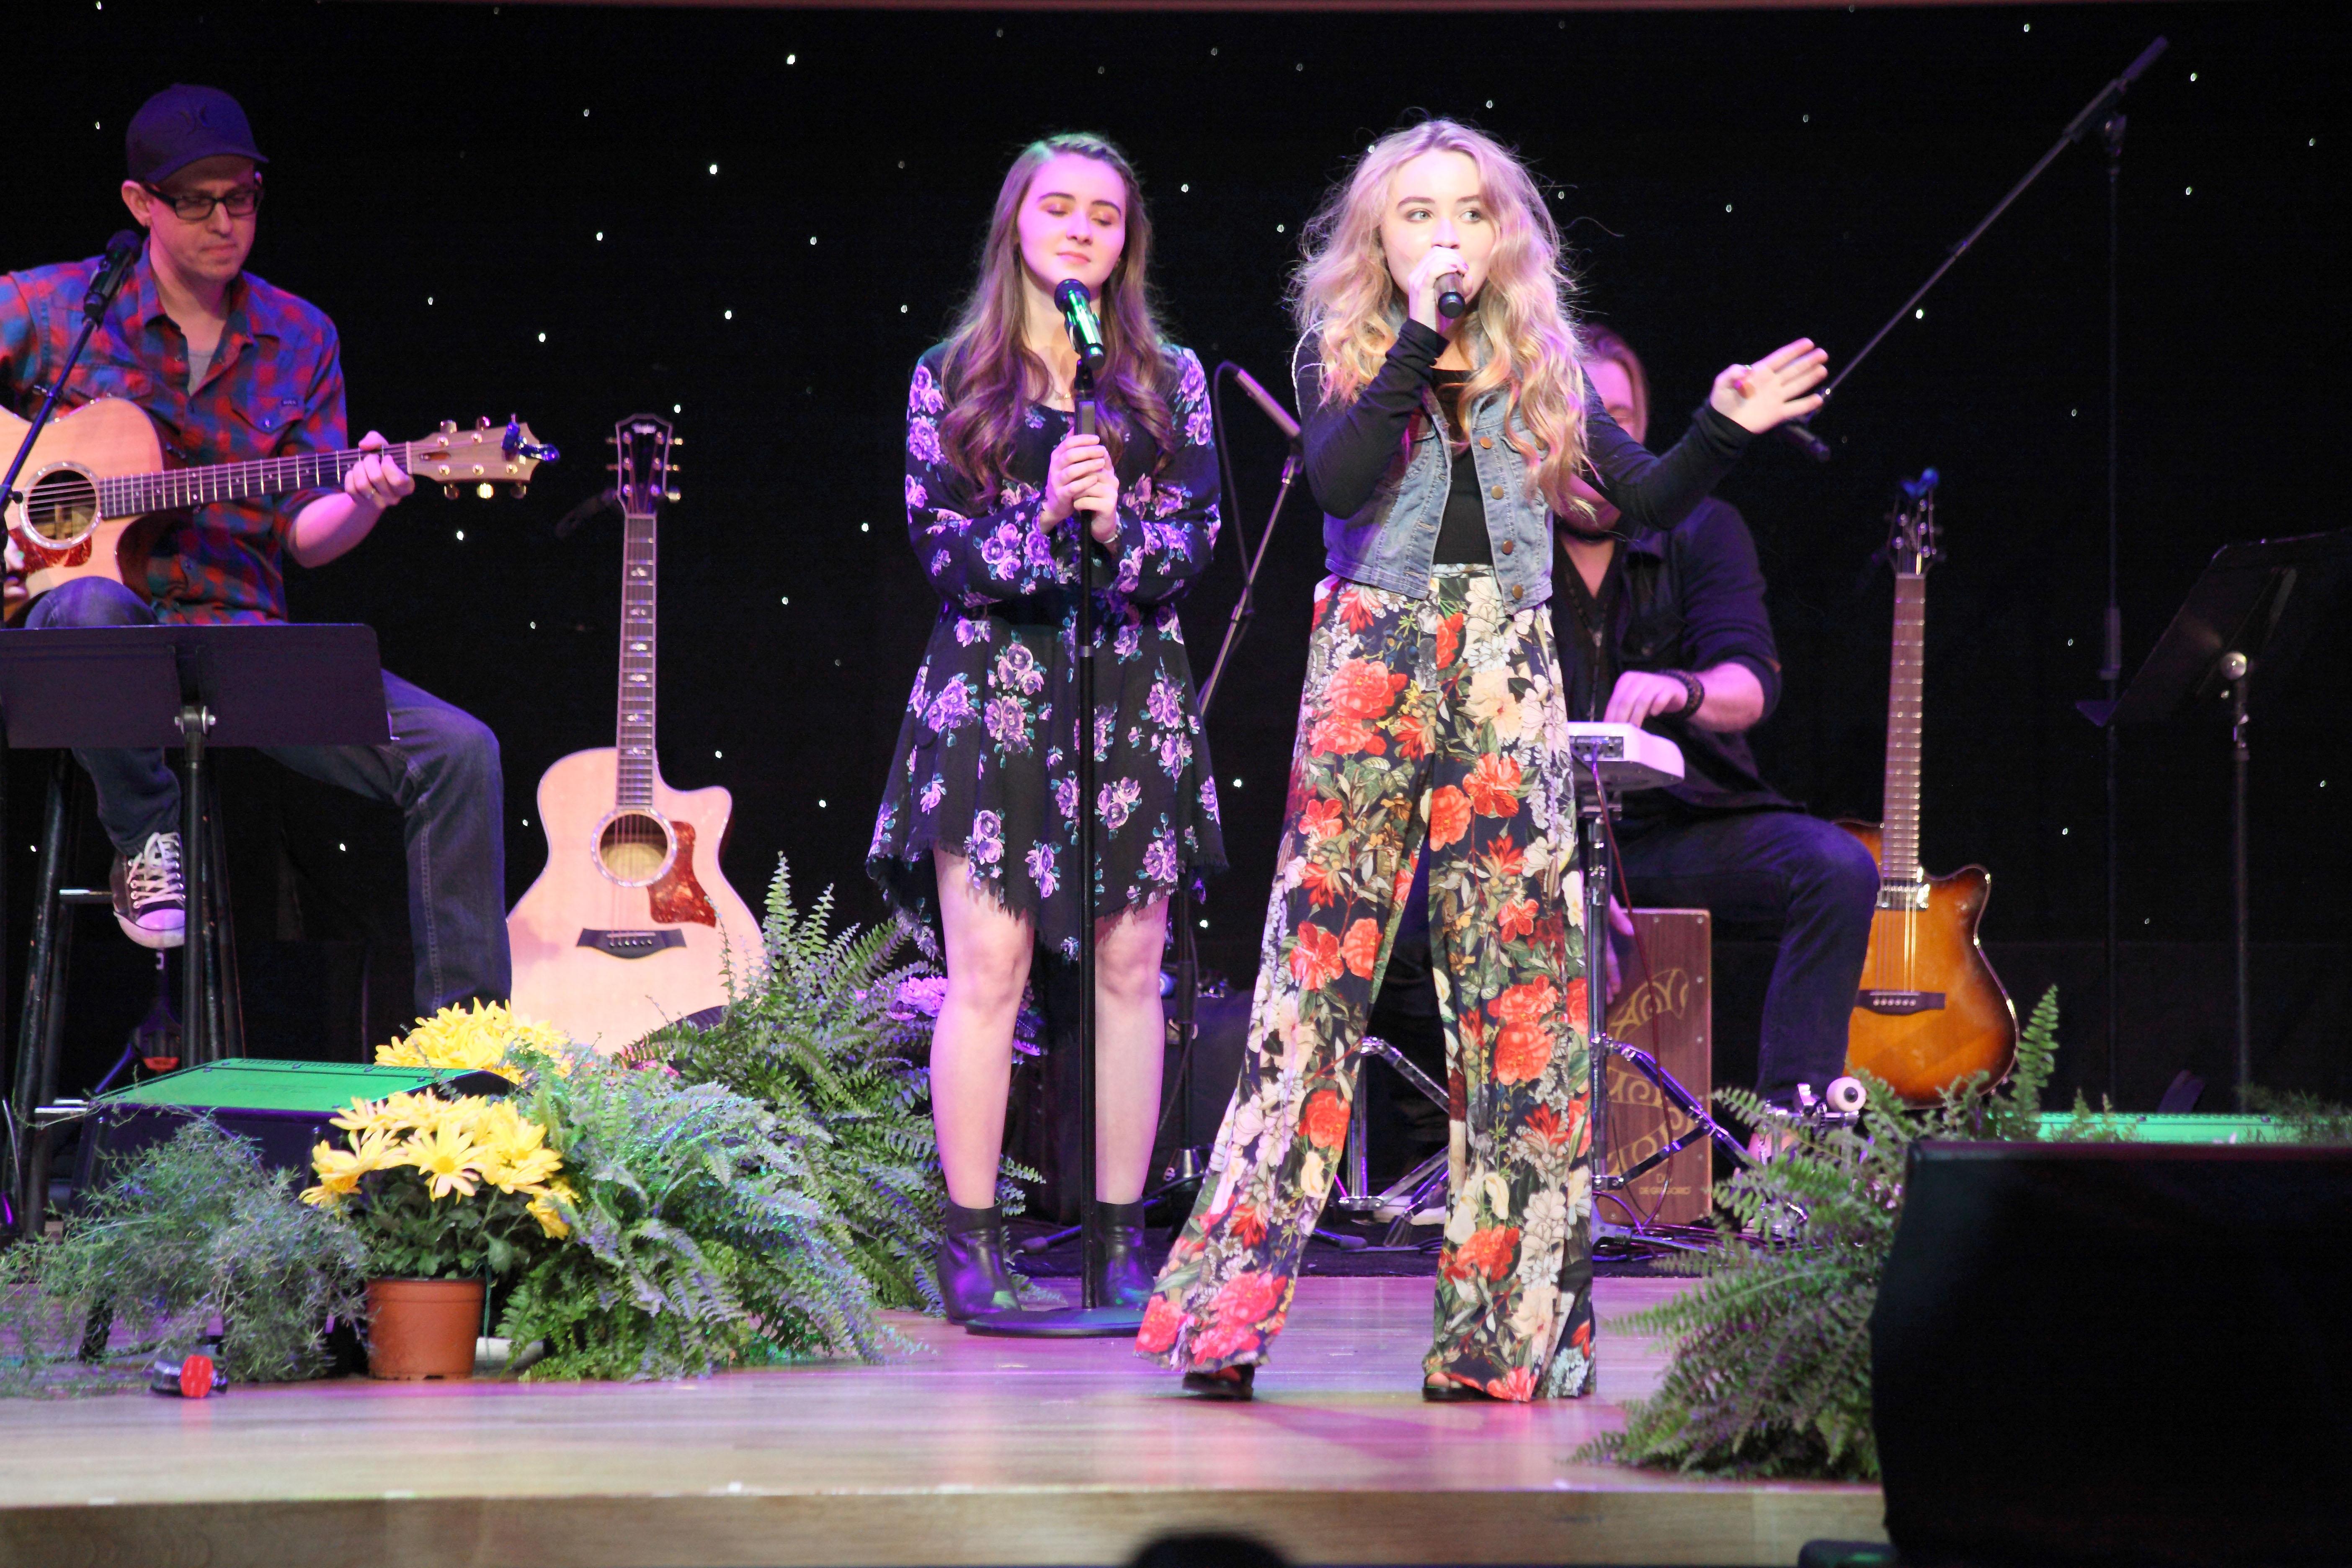 9 December 2019 English Sabrina Carpenter at Disney Social Media Moms Conference 2014